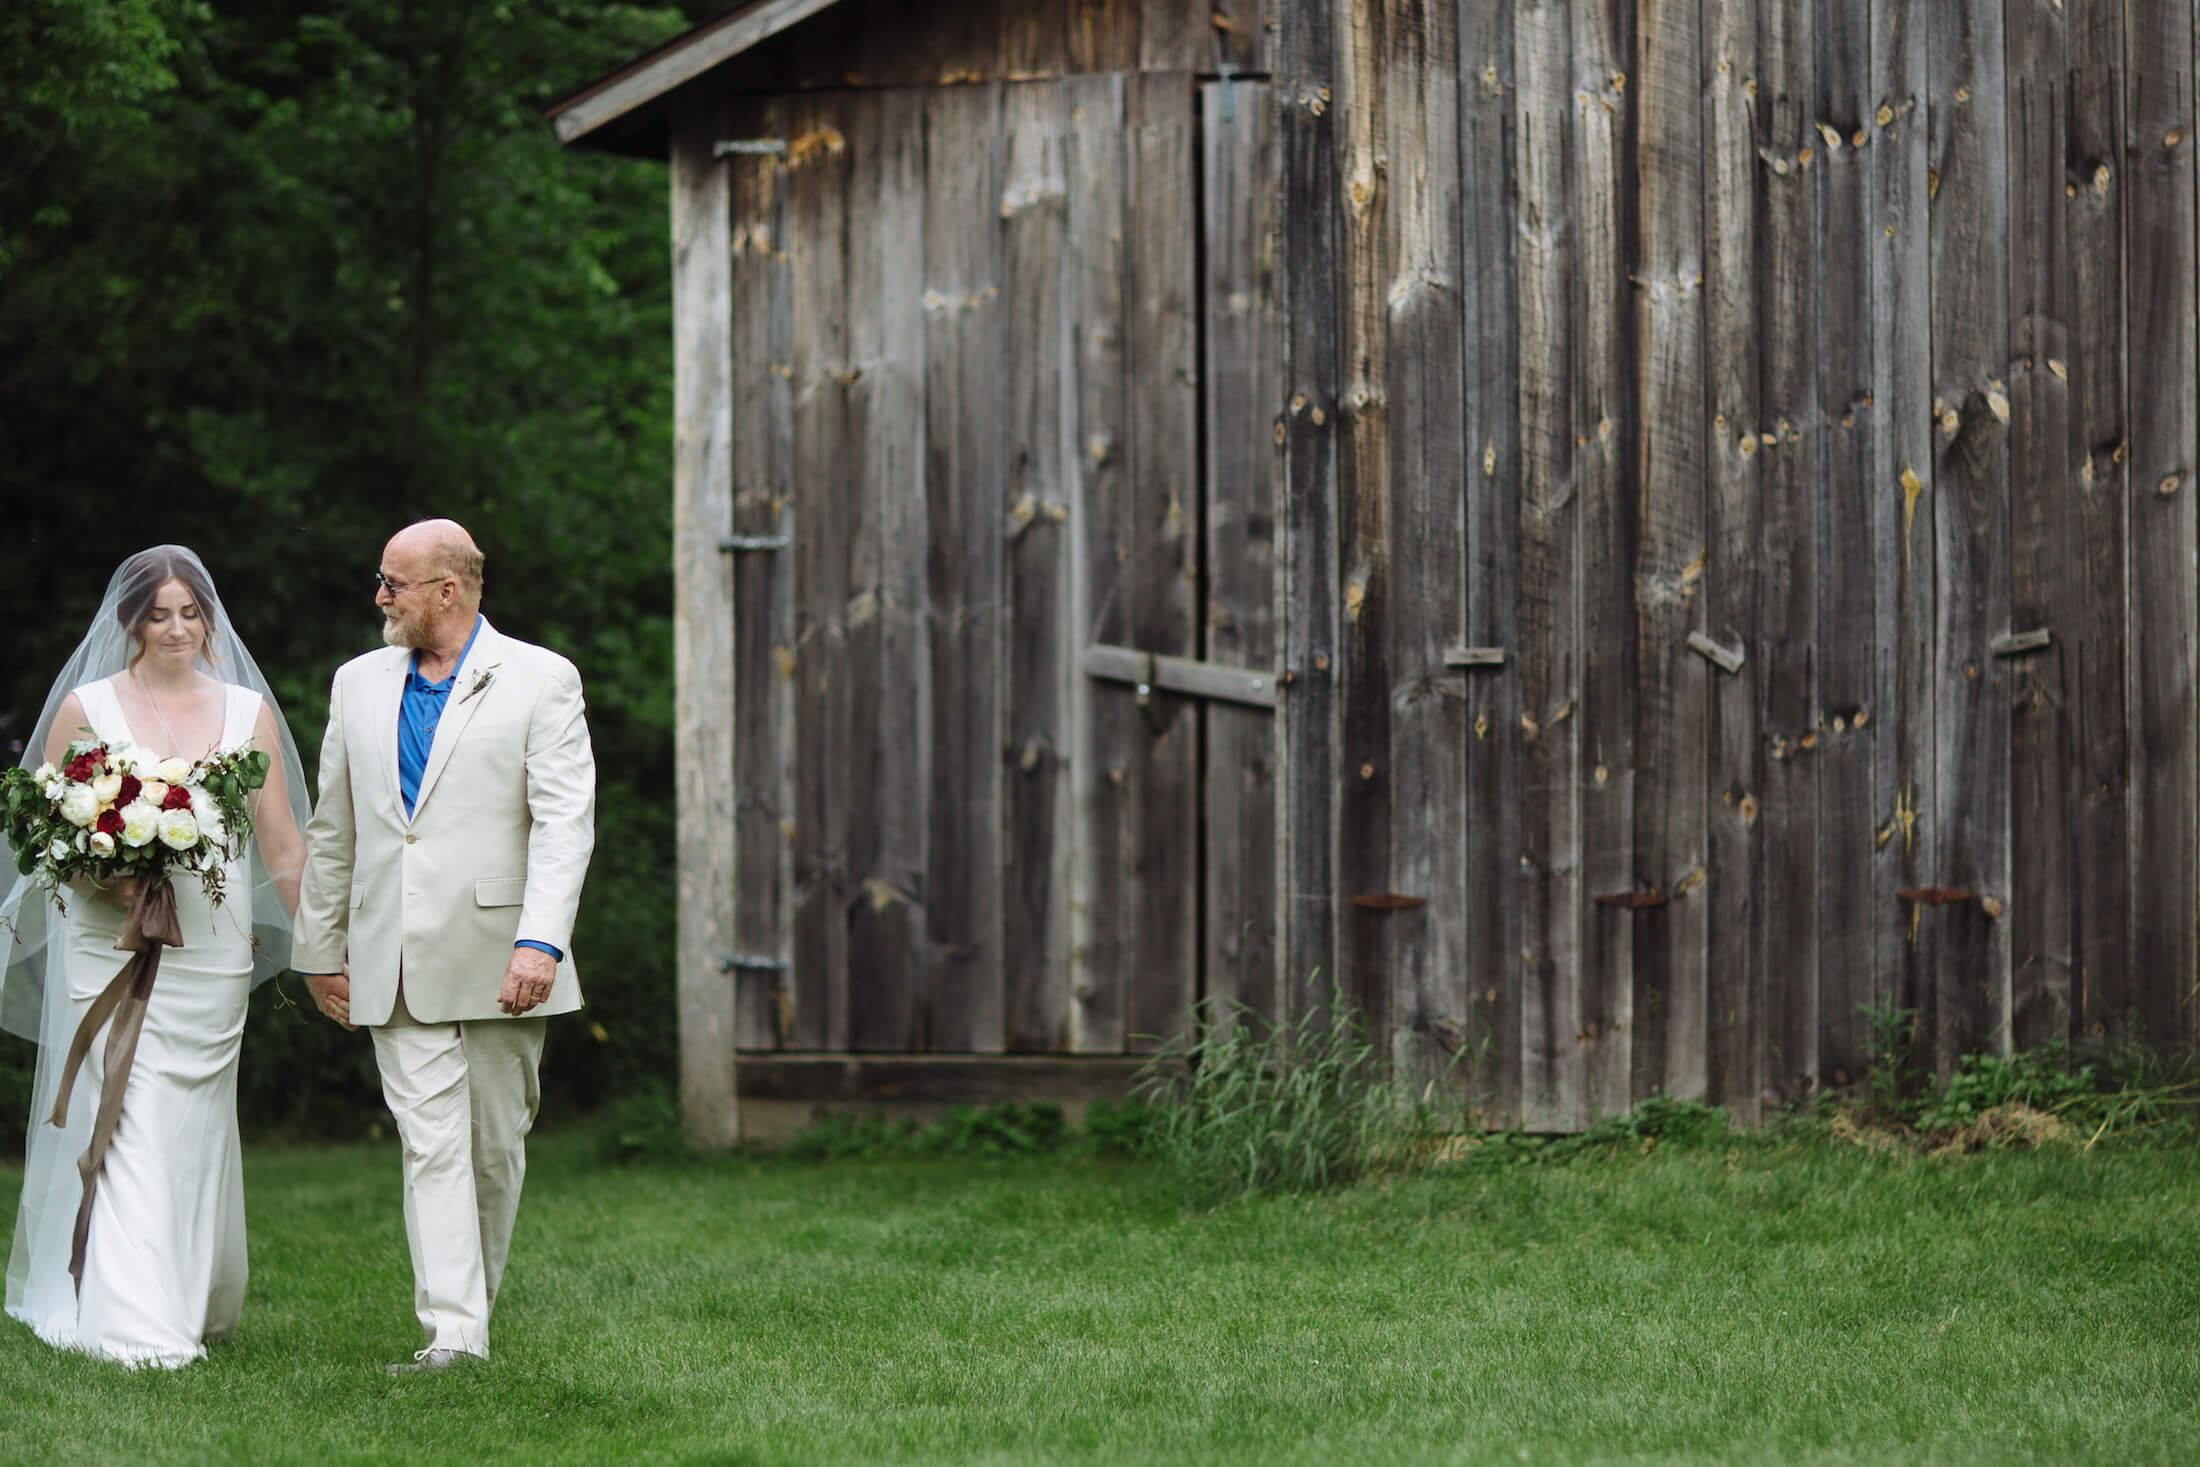 engle-olson-ray-kelly-photography-wisconsin-wedding-61.jpg